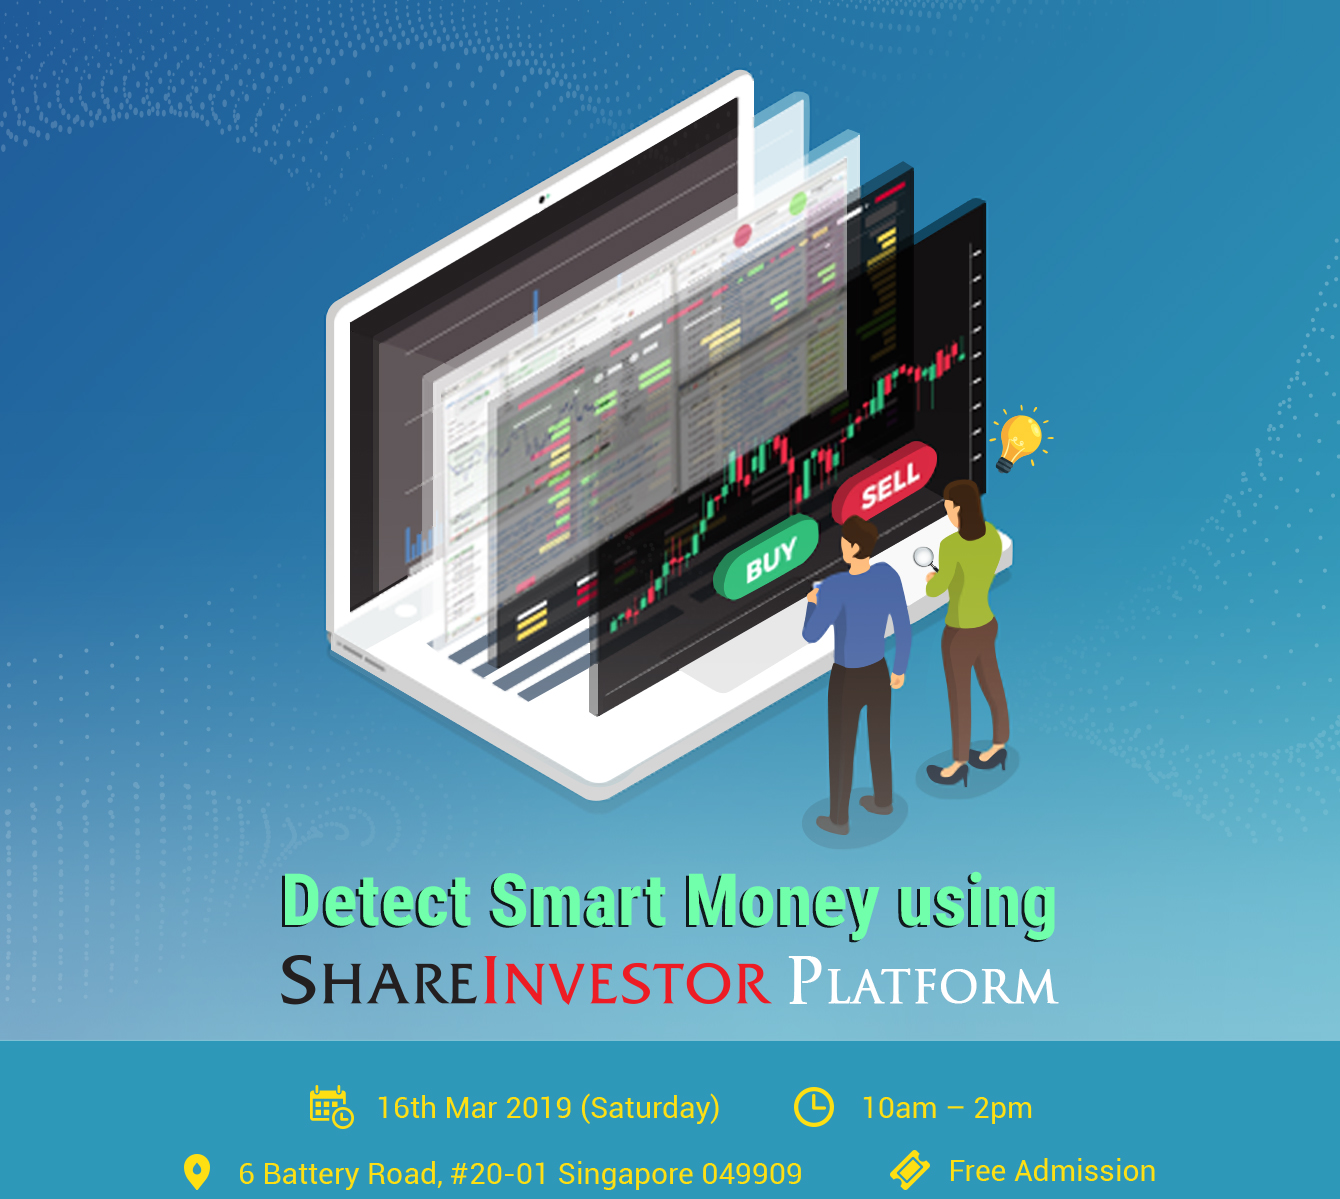 Detect Smart Money using ShareInvestor Platform